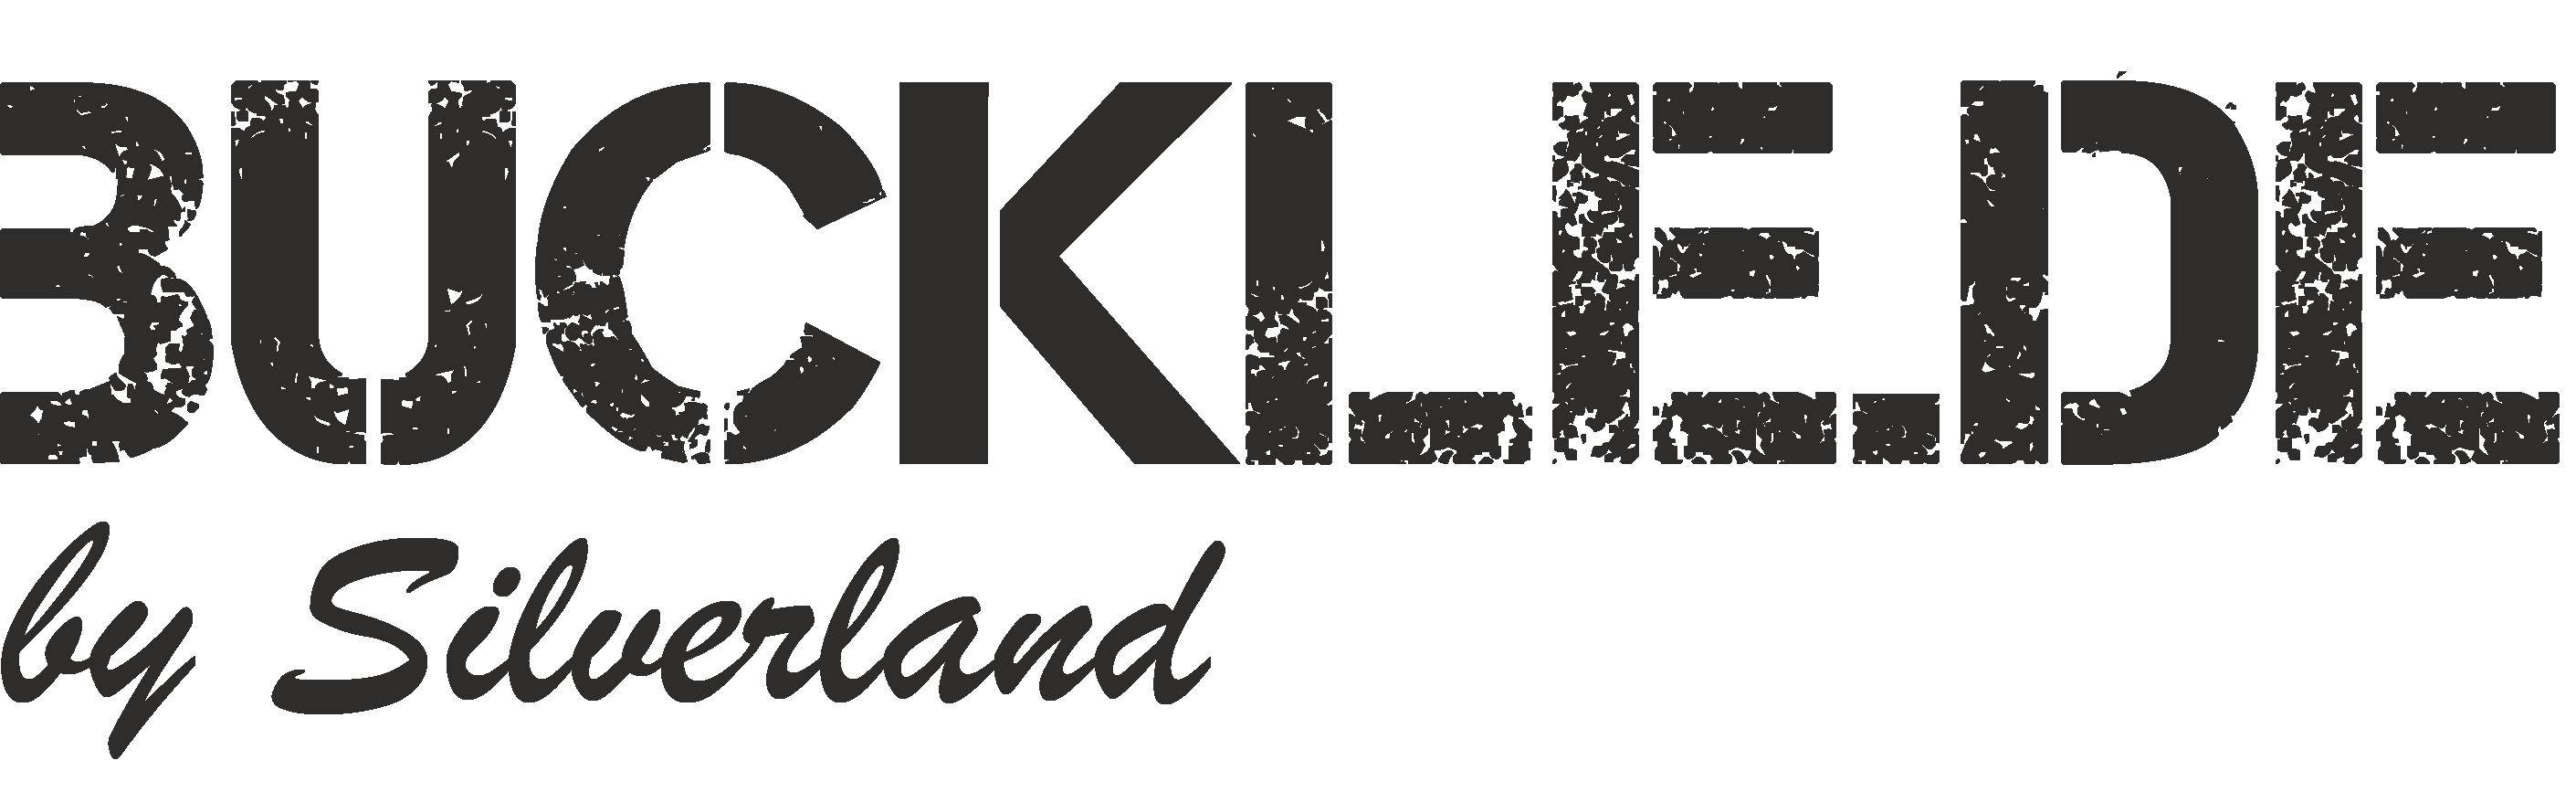 Buckle.de-Logo